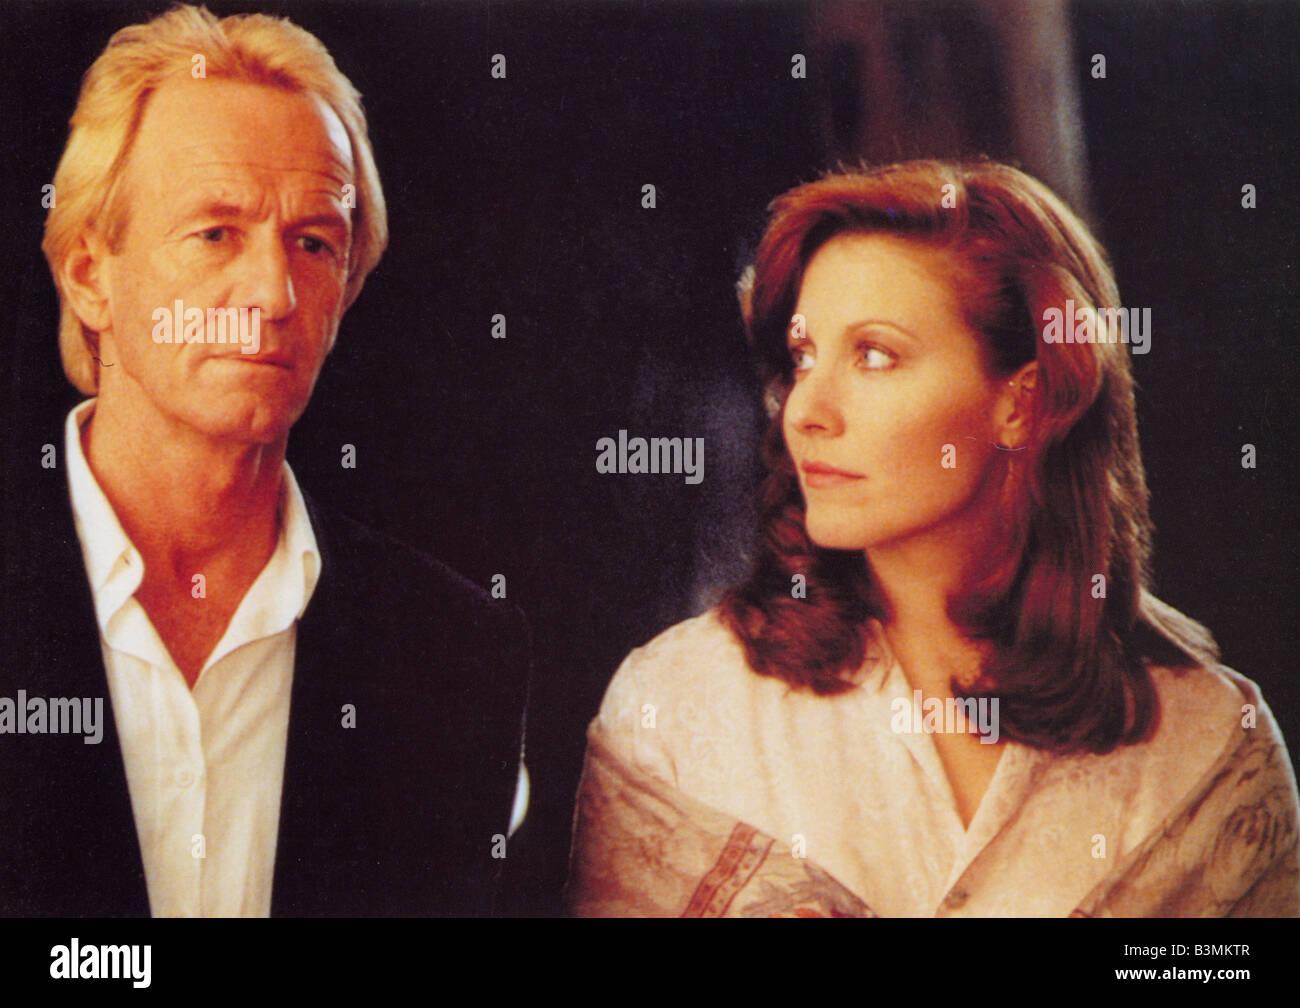 Quasi un angelo 1990 UIP/Paramount film con Paul Hogan e Linda Kozlowski Immagini Stock